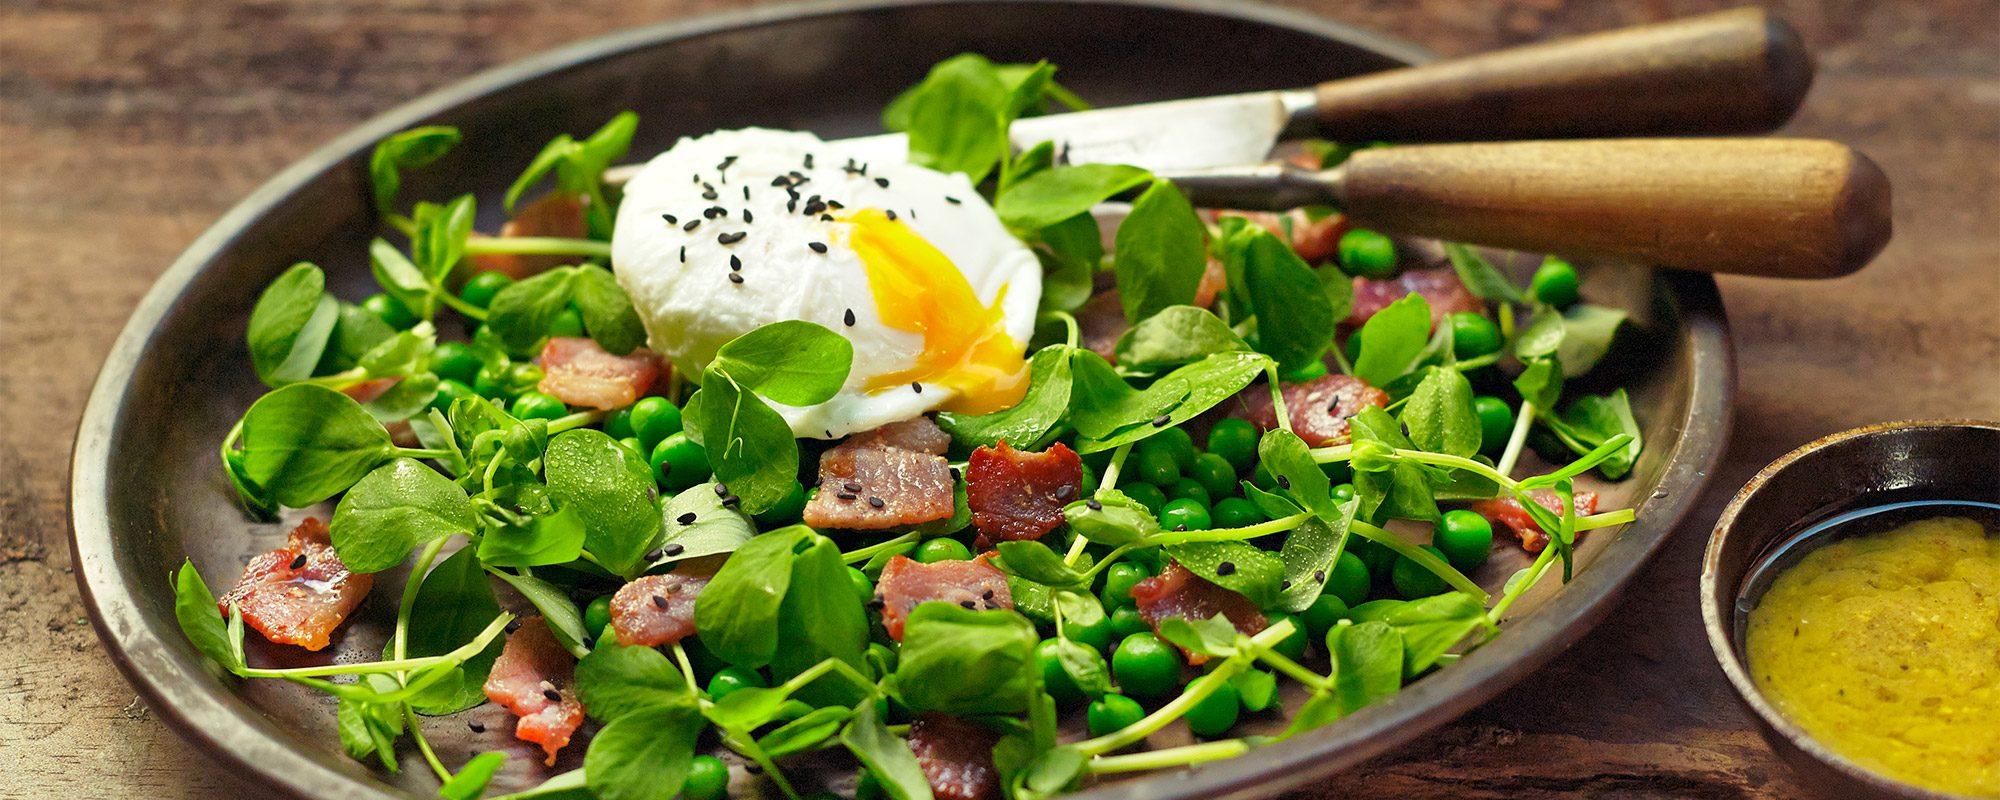 Pea Shoots Salad by John